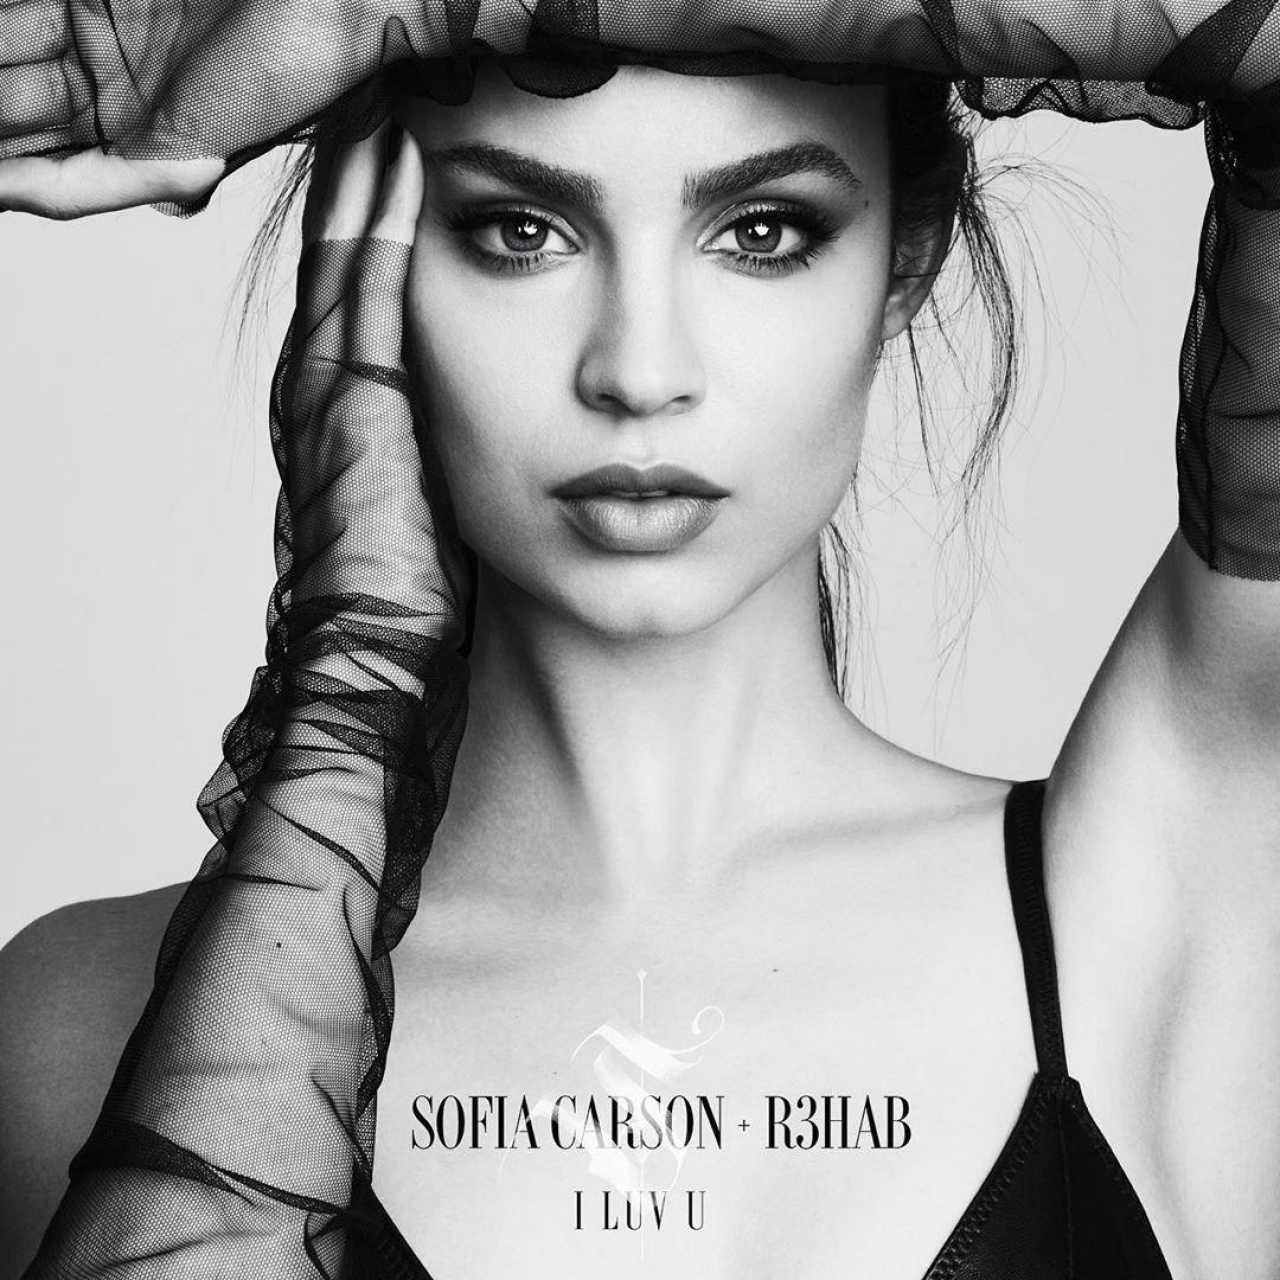 Sofia Carson 2020 : Sofia Carson – Instagram and social media pics-12